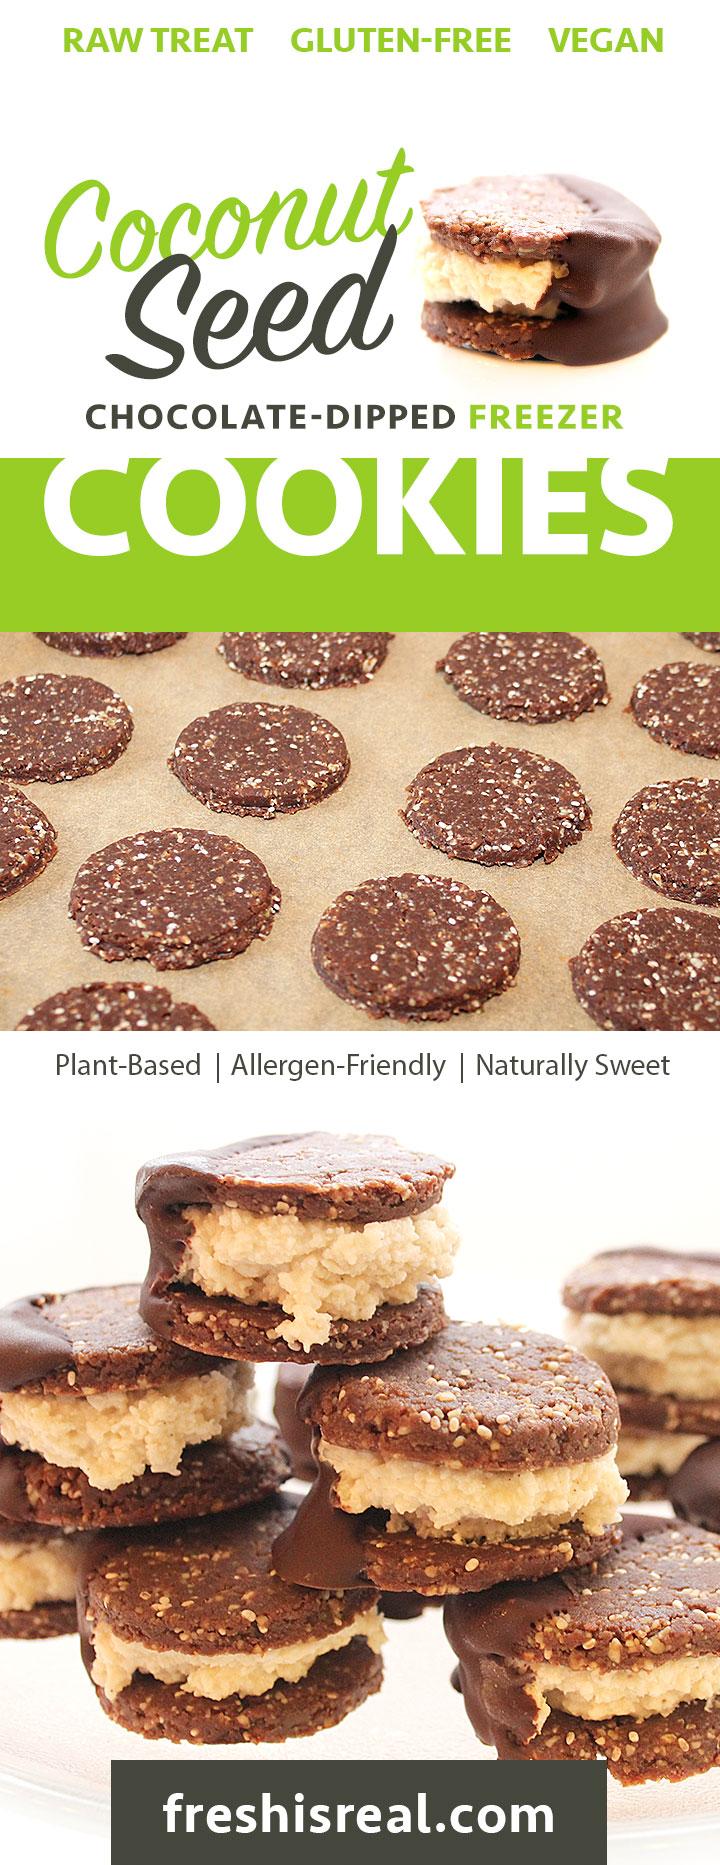 Fun-to-make Raw Vegan Coconut Seed Chocolate-Dipped Freezer Cookies | Chantal | freshisreal.com